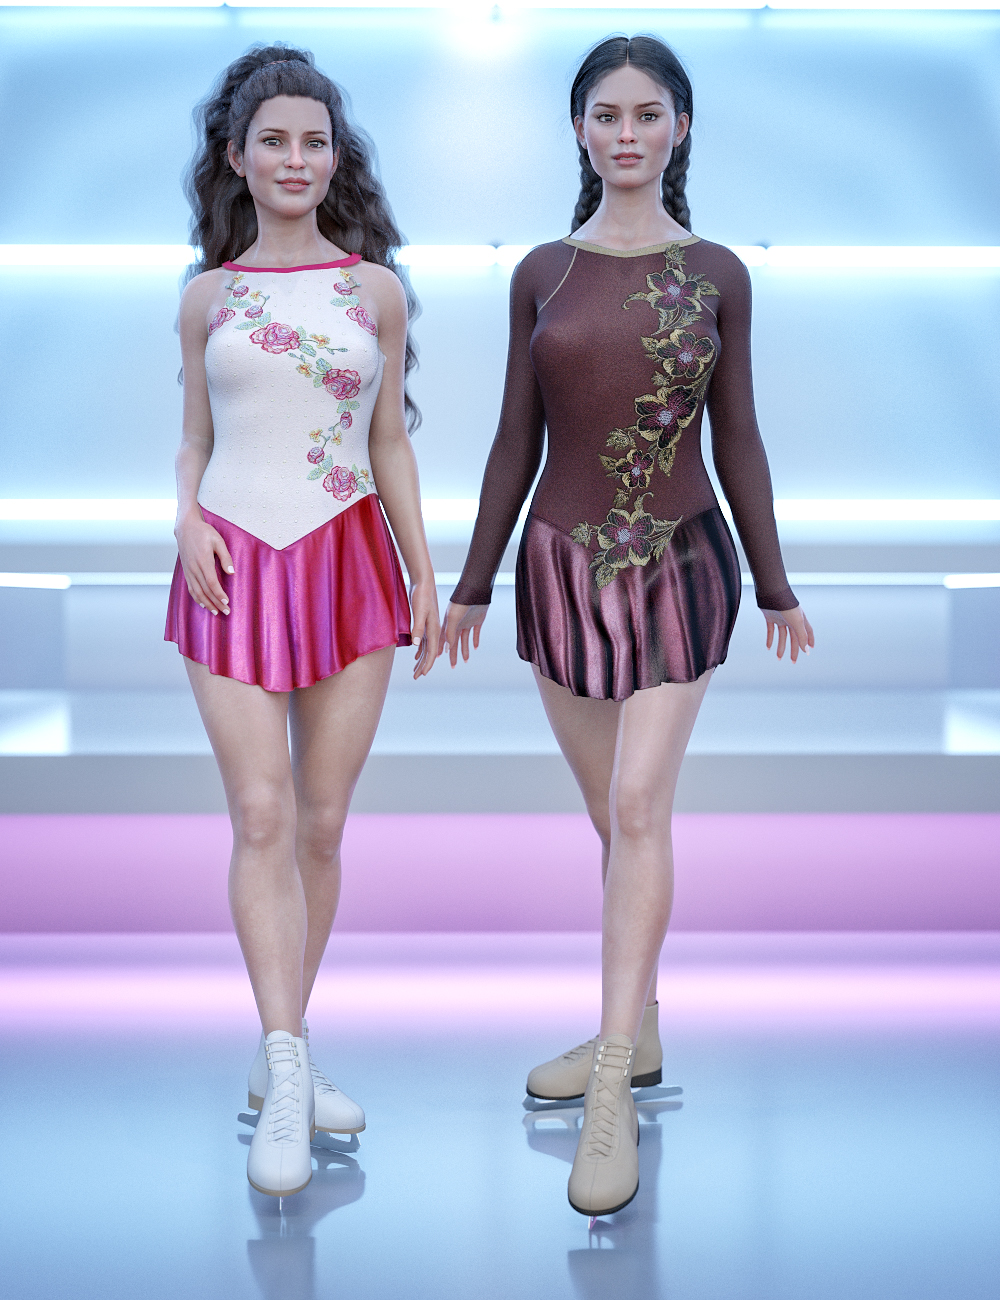 dForce Figure Skater Outfit Textures by: Sarsa, 3D Models by Daz 3D